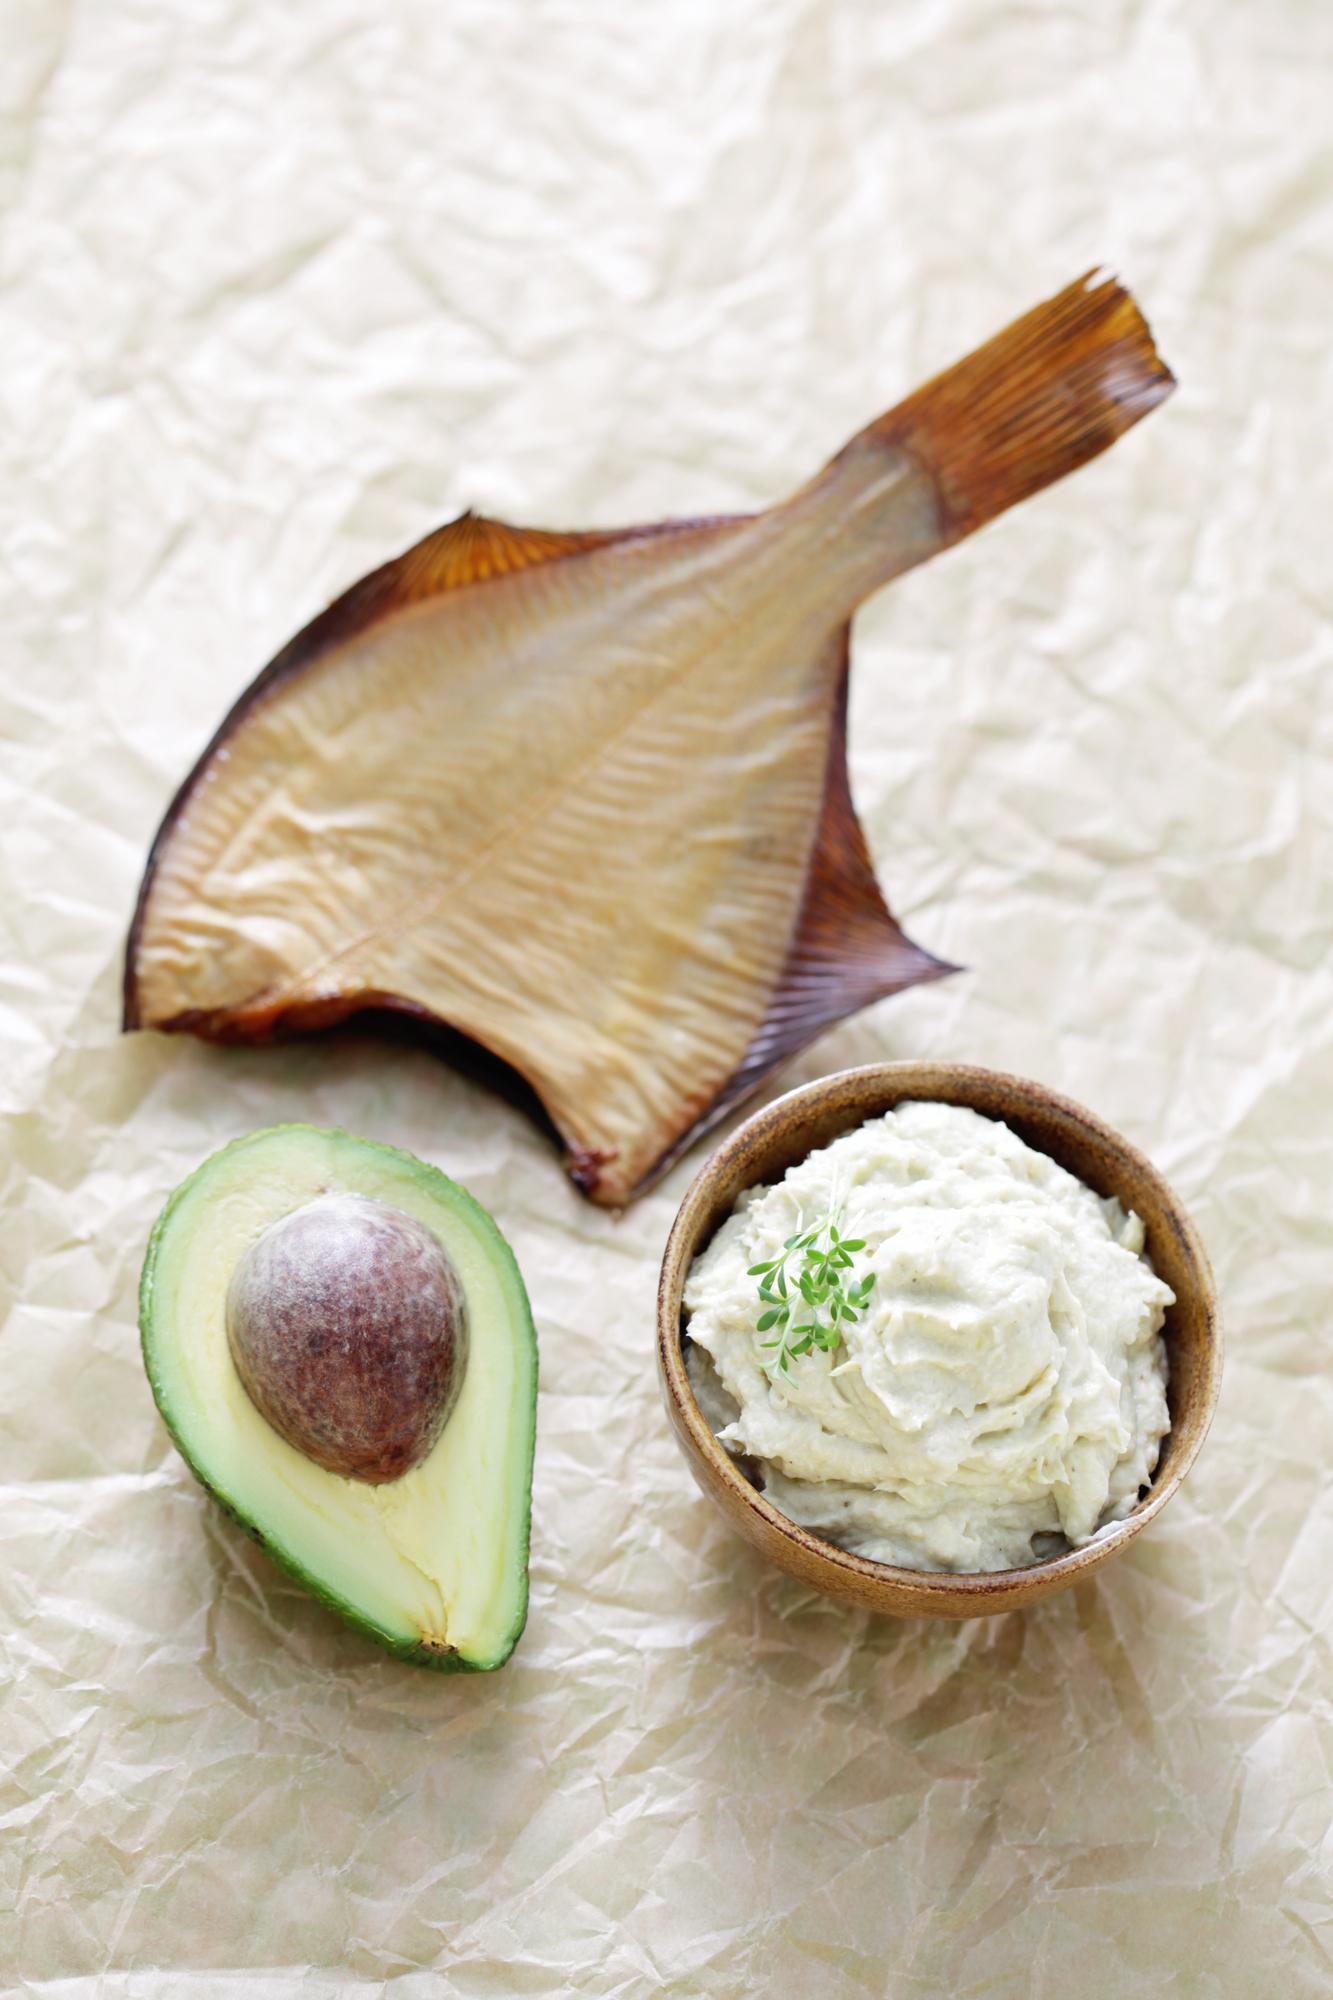 Паштет из грибов и авокадо: рецепт аппетитной закуски